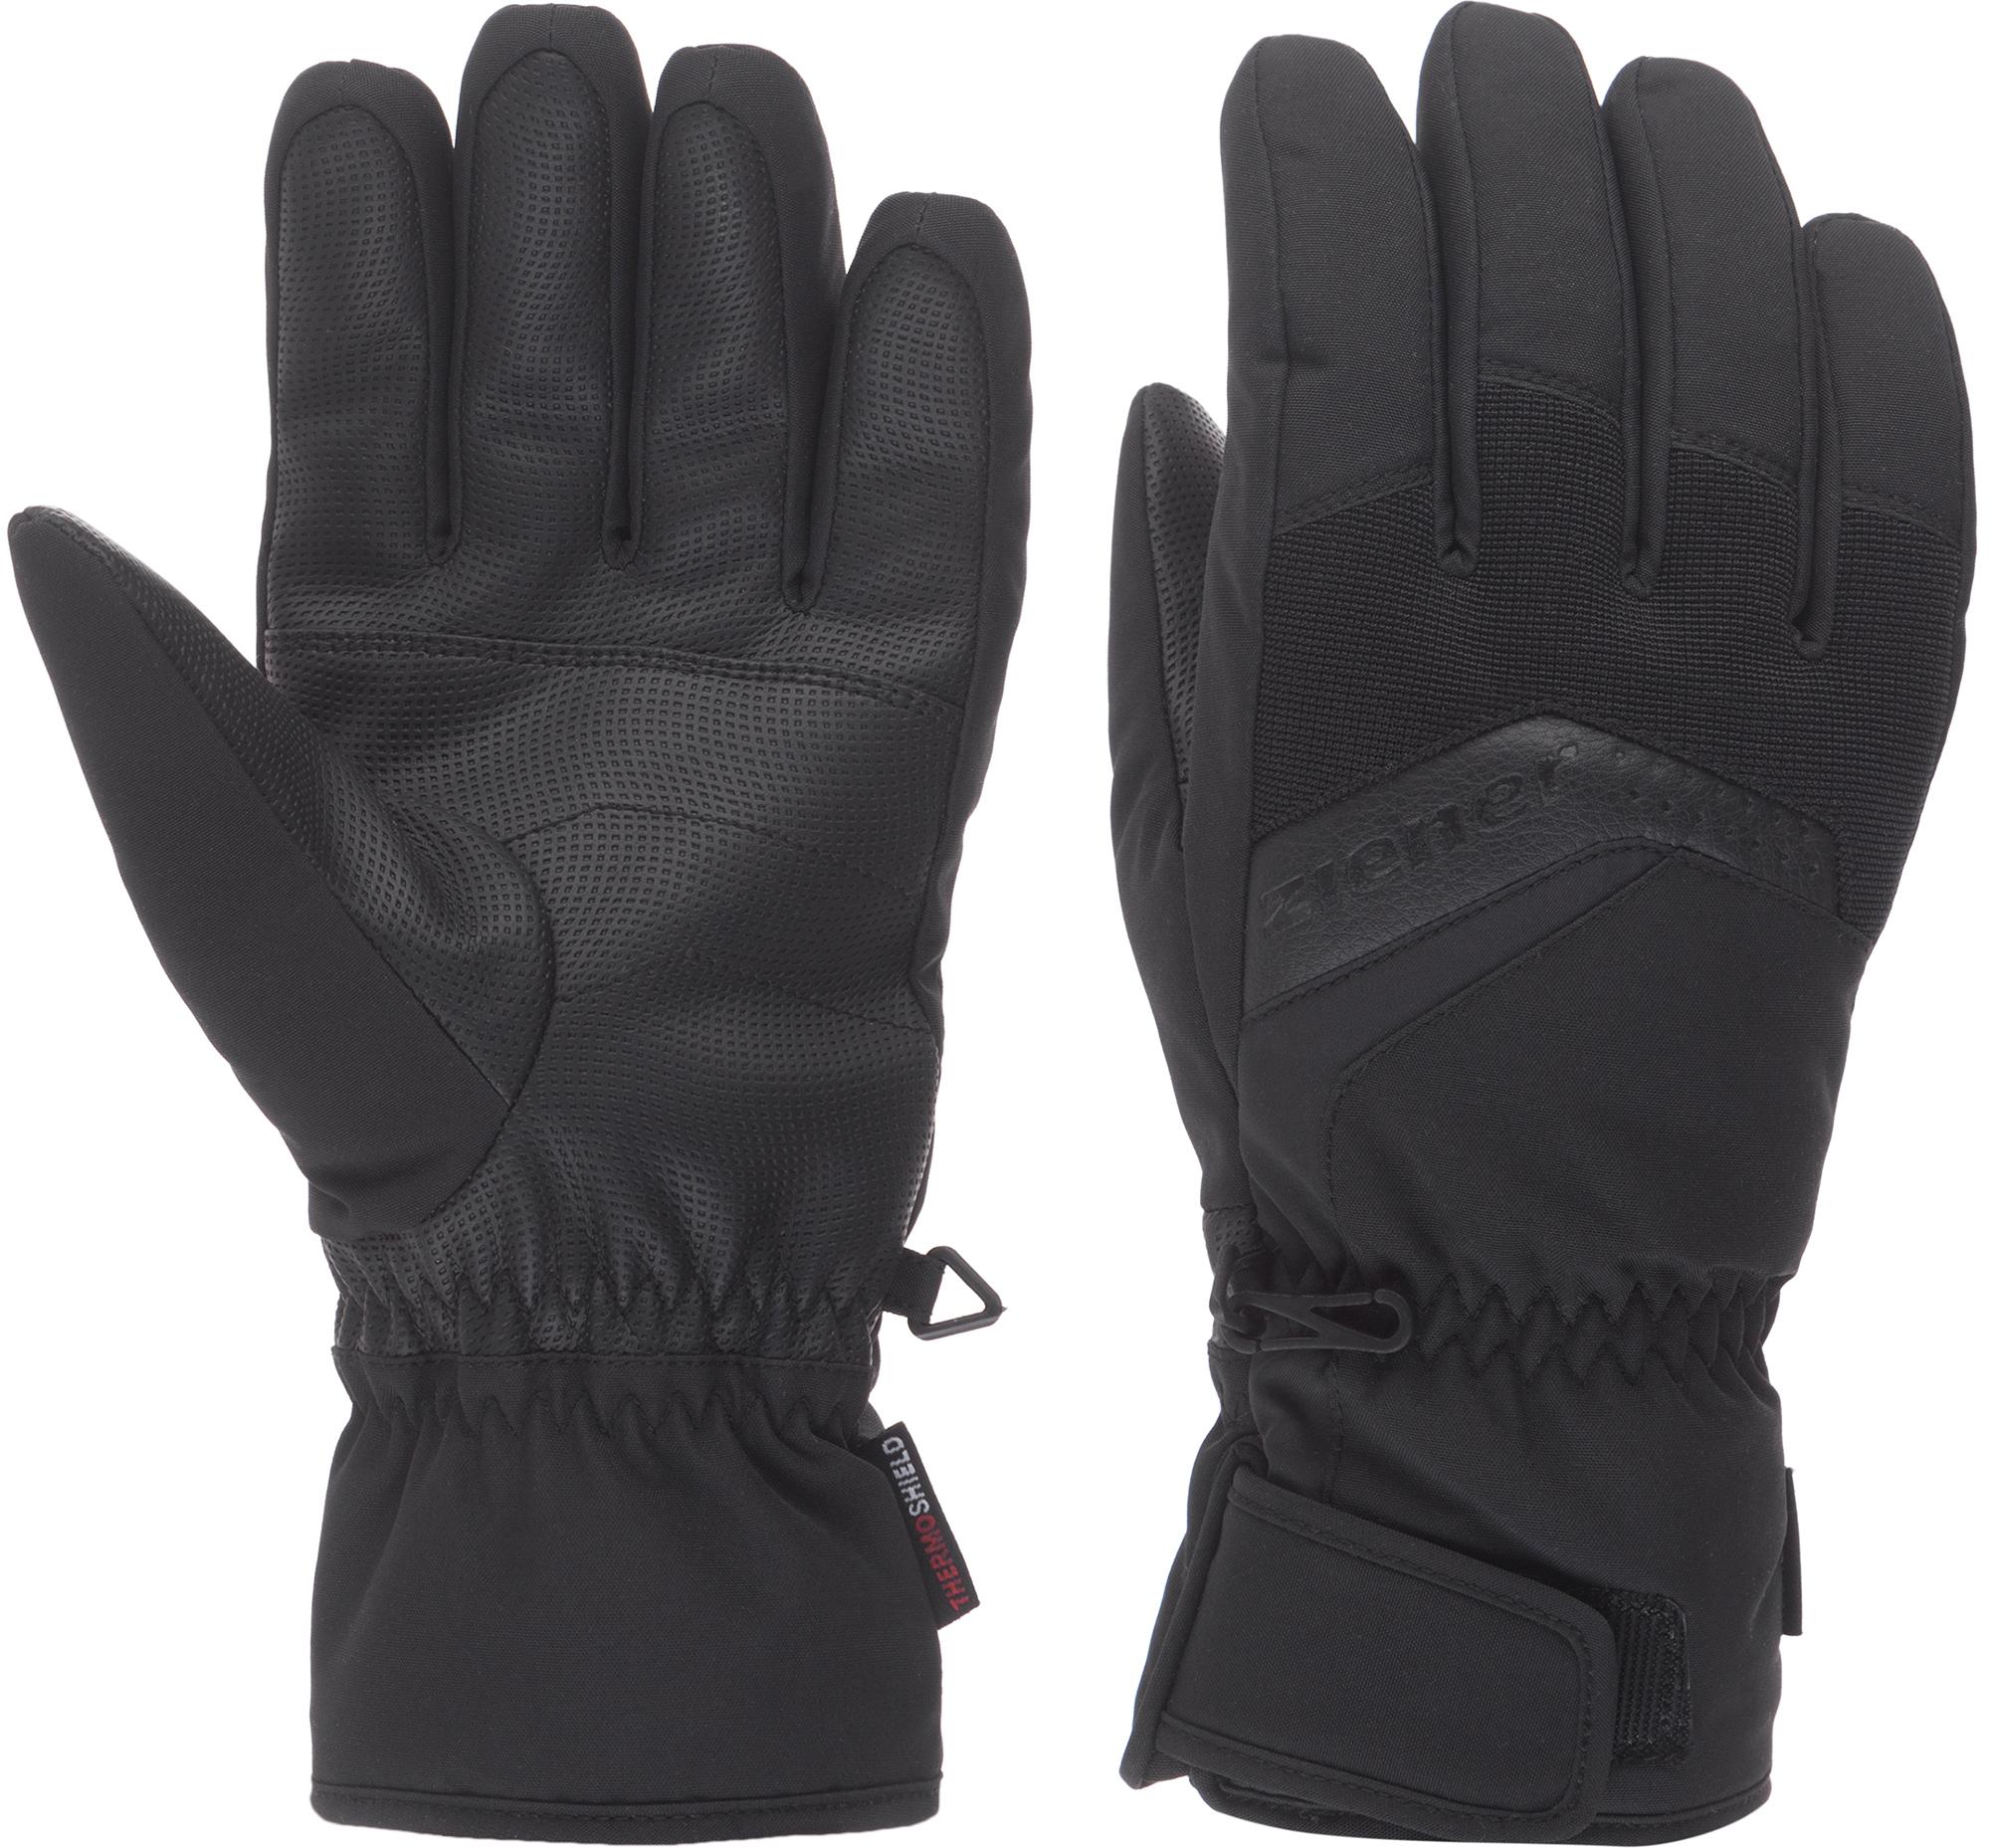 Ziener Перчатки мужские Ziener Gabino, размер 10 ziener перчатки мужские ziener gliss gtx размер 9